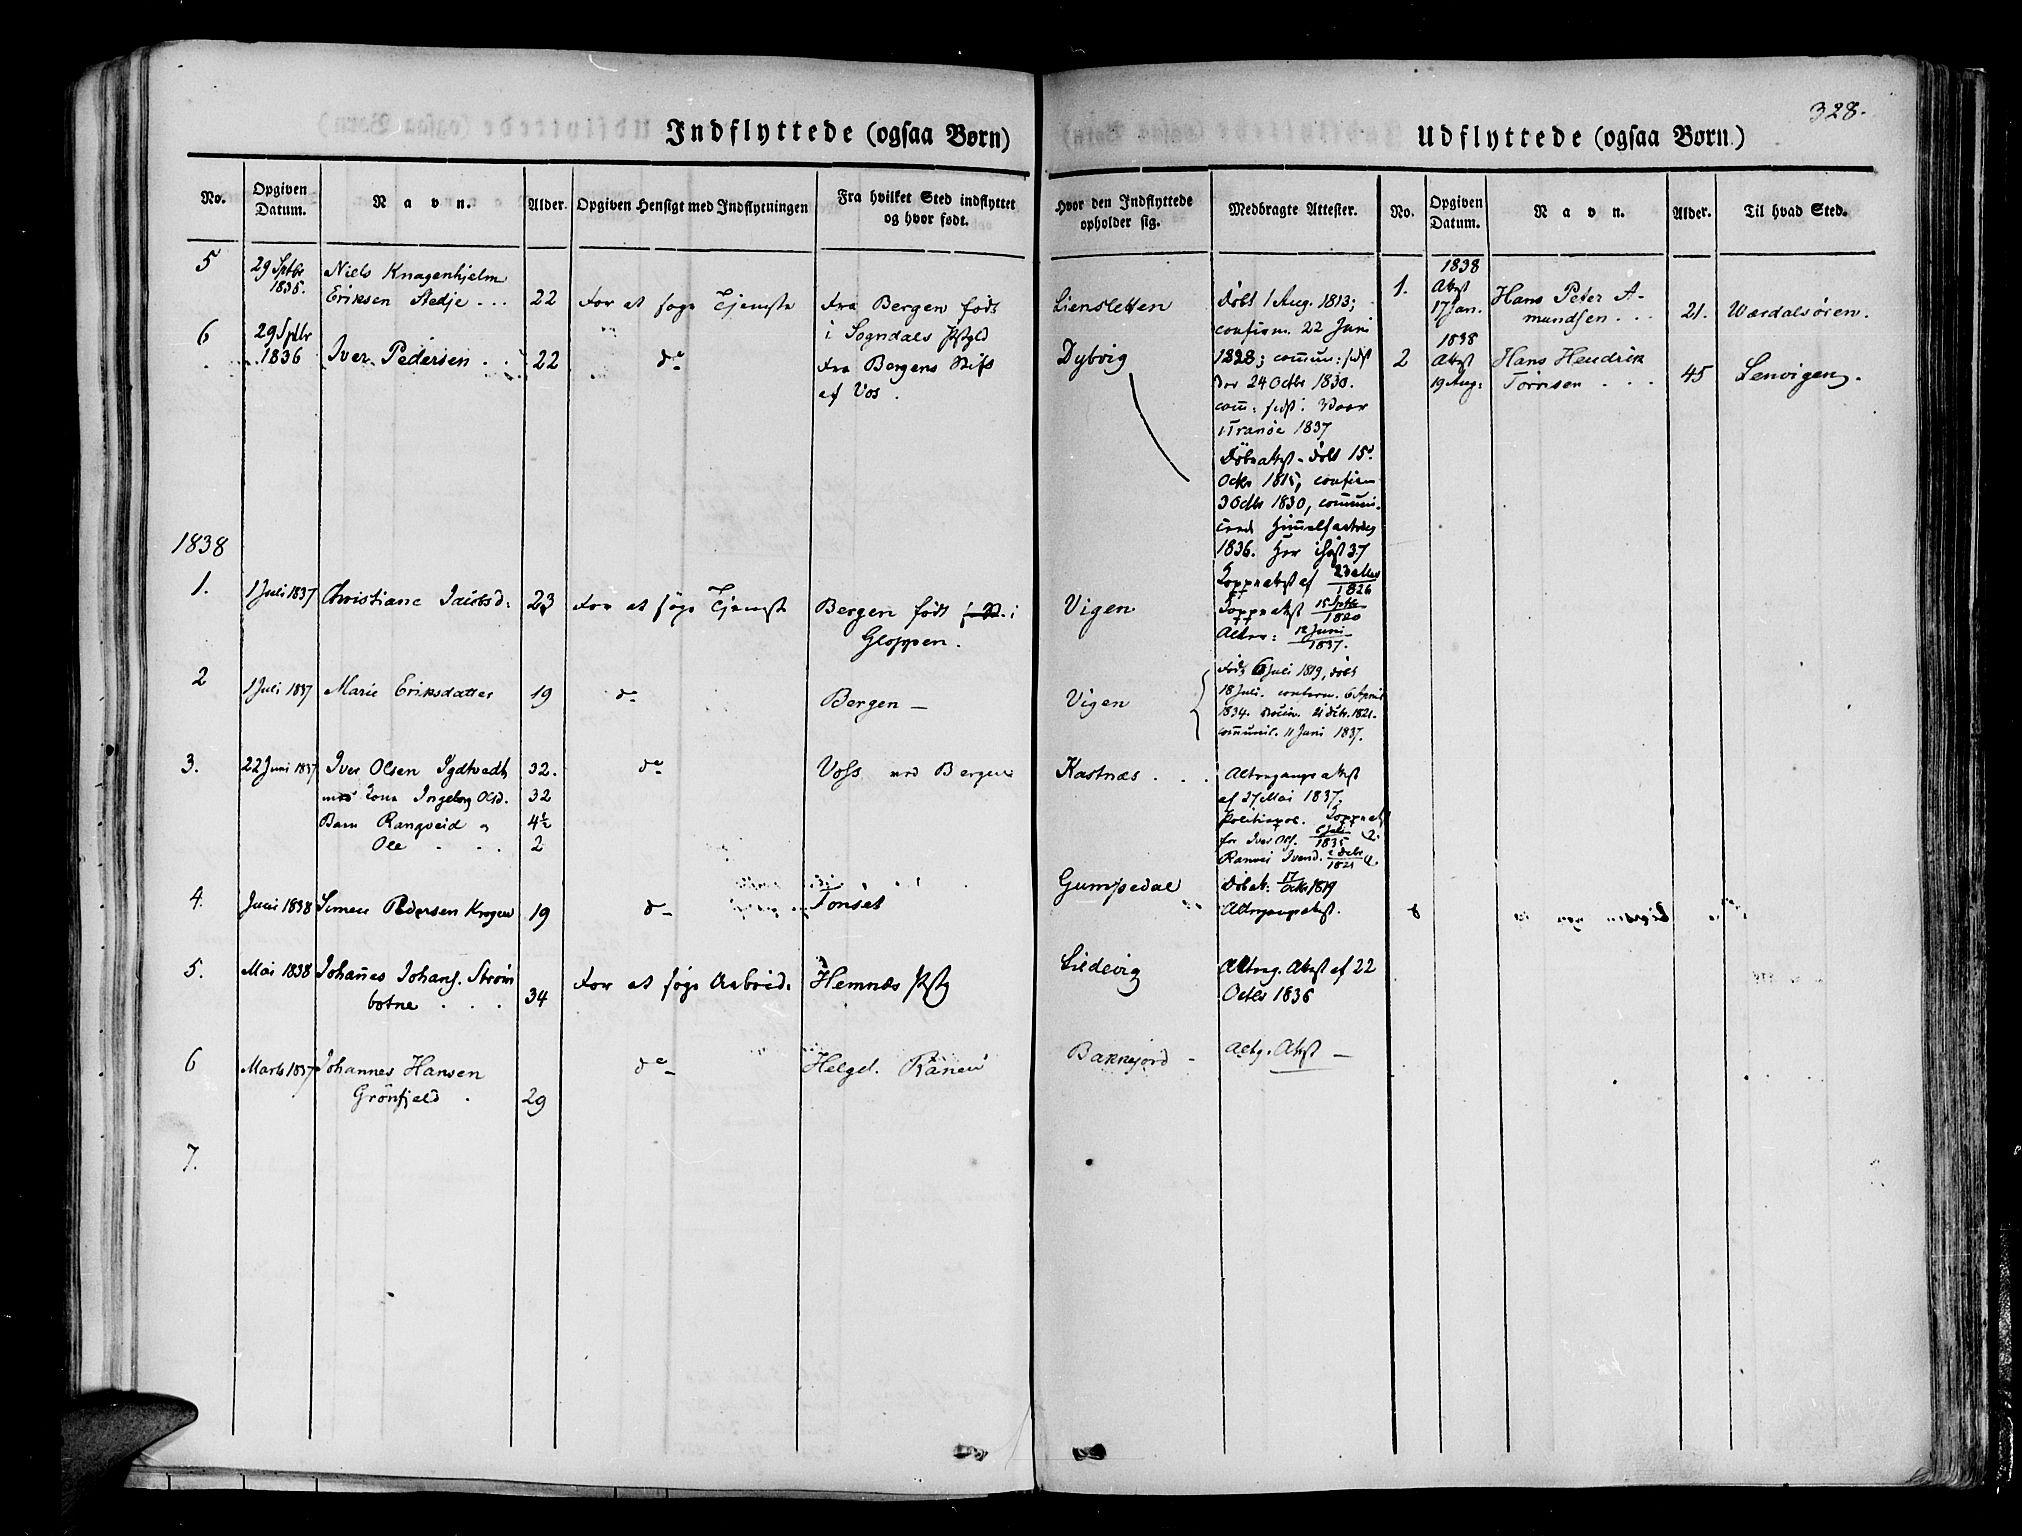 SATØ, Tranøy sokneprestkontor, I/Ia/Iaa/L0005kirke: Ministerialbok nr. 5, 1829-1844, s. 328